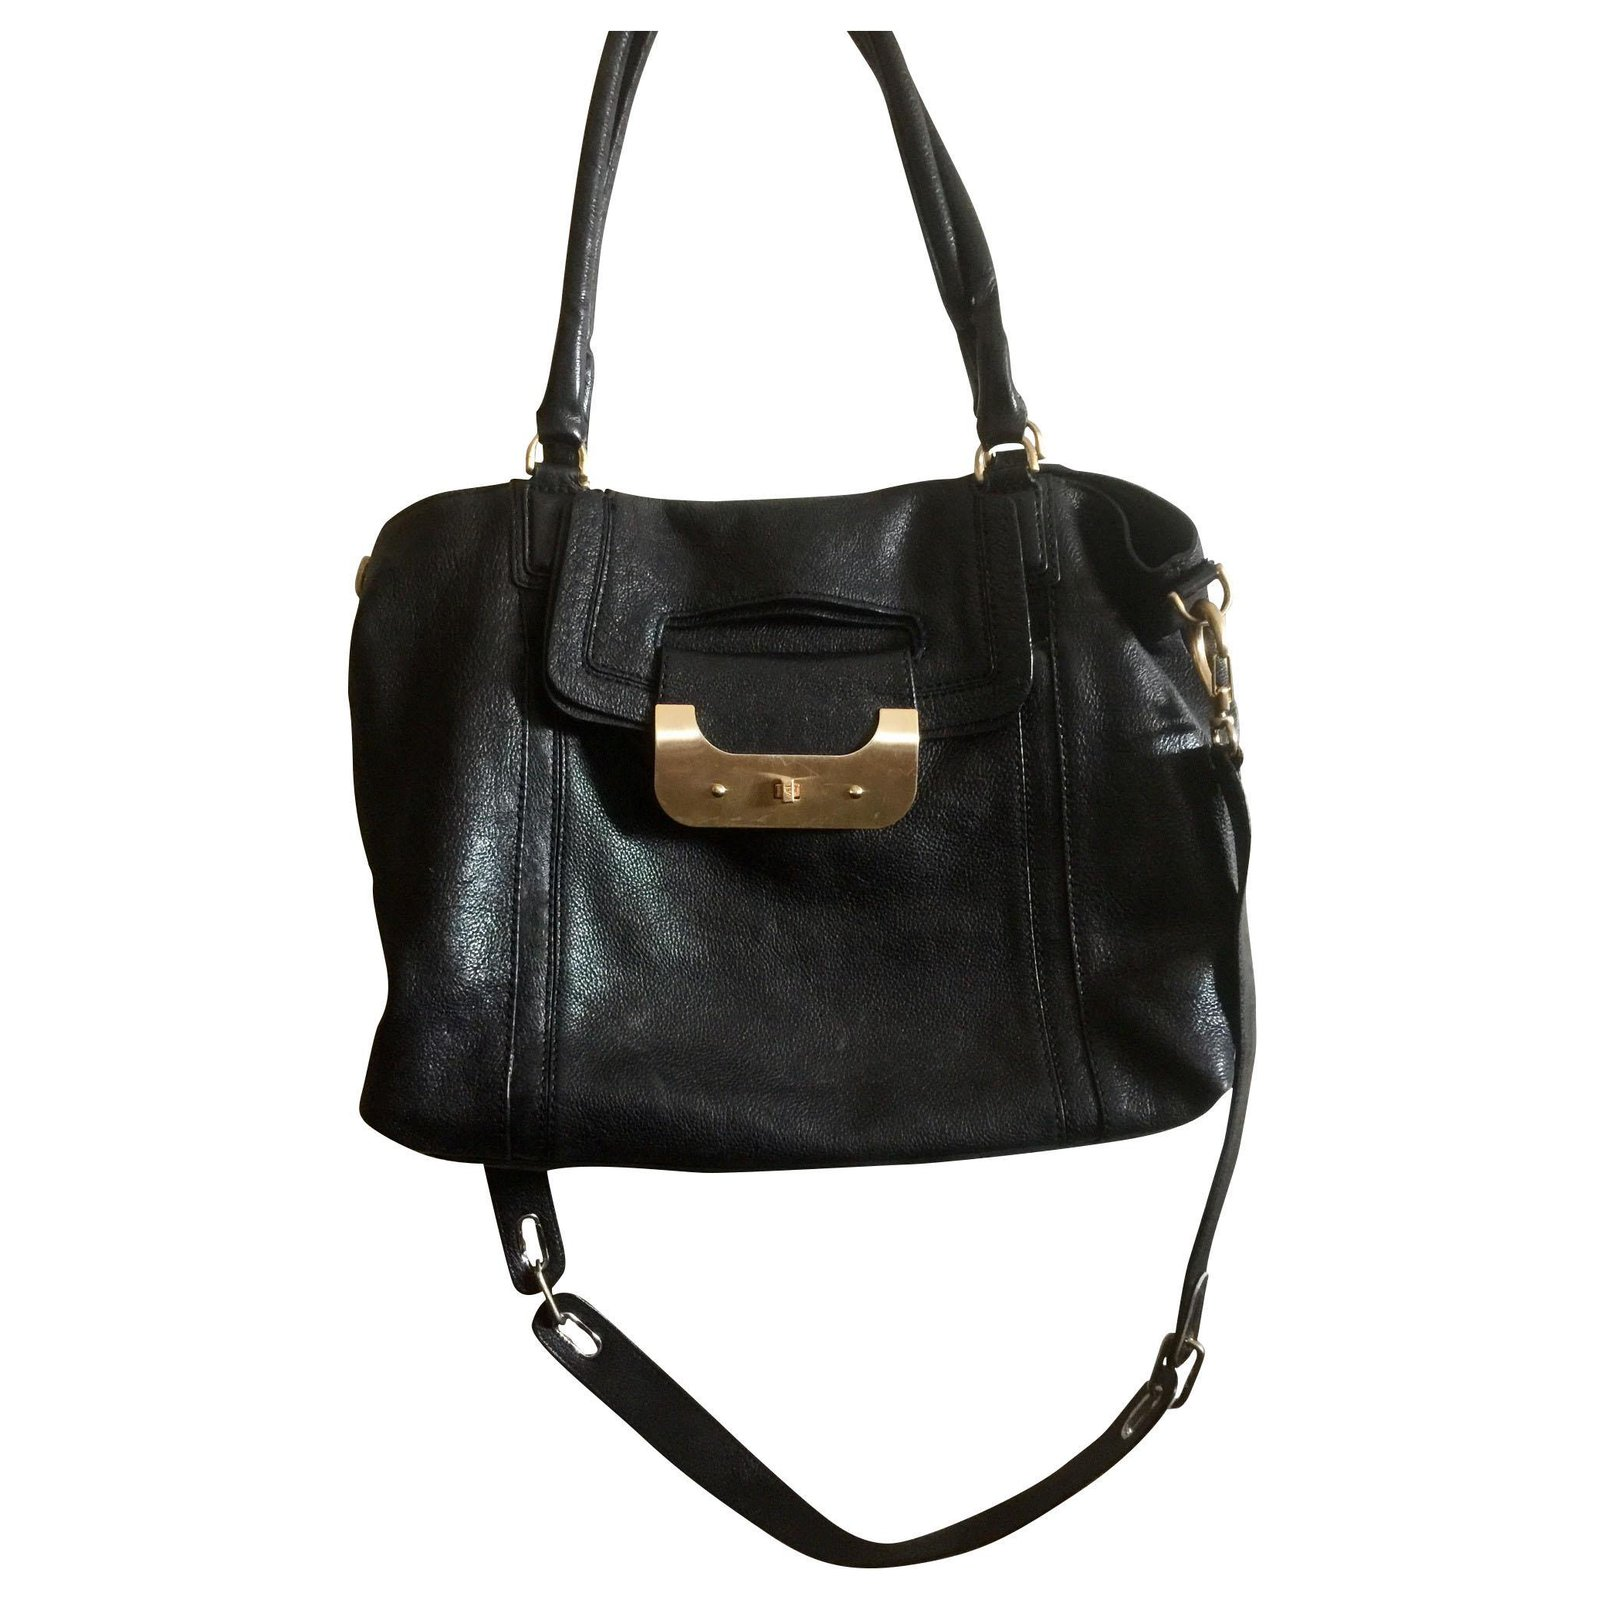 Dvf Large Leather Bag Handbags